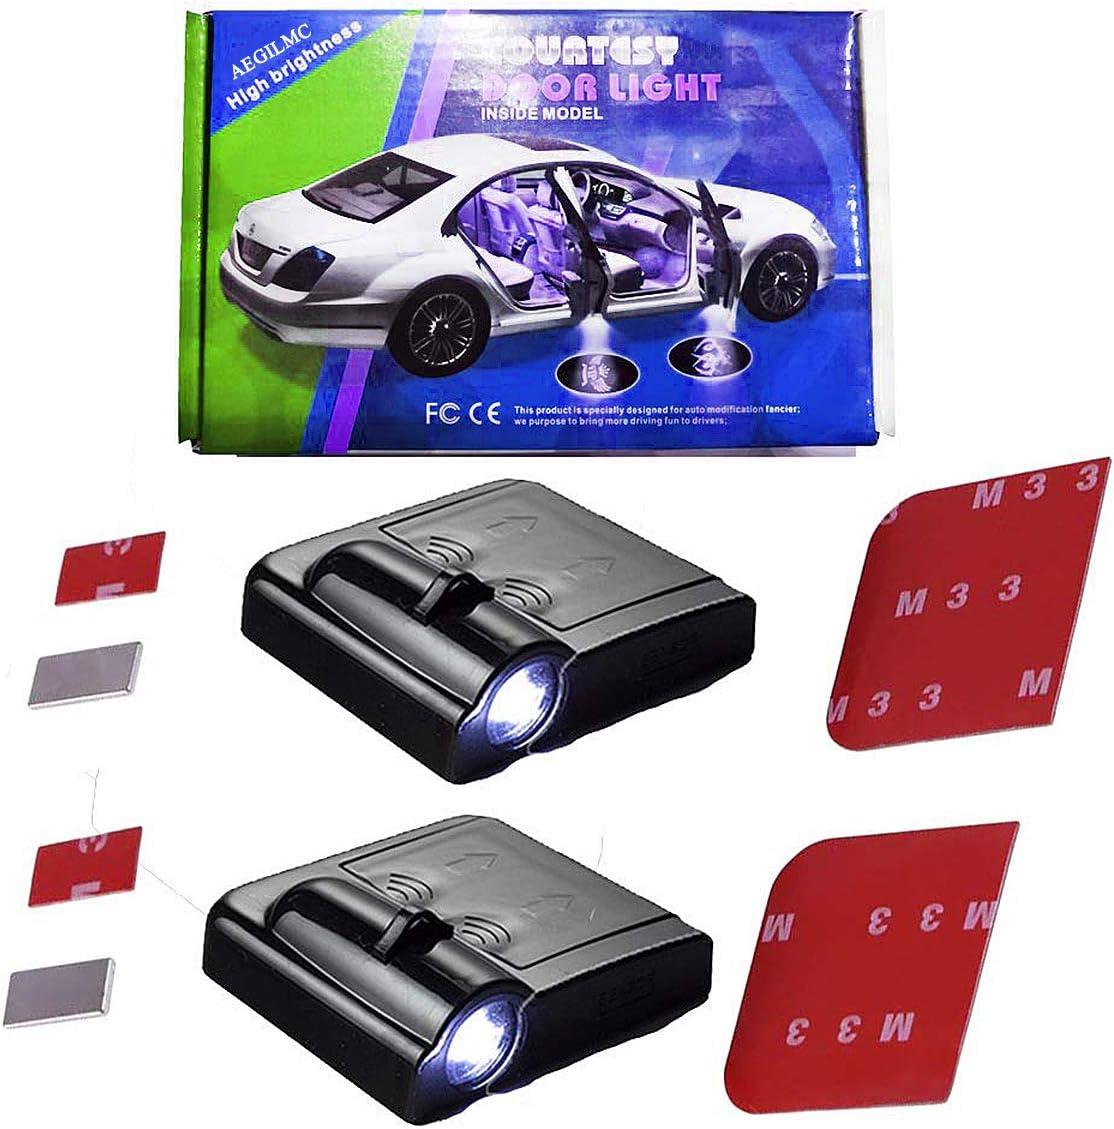 LED Magnet Drahtlose Lampe Smart Led Projektor Ghost Shadow Licht Auto Embleme Door Courtesy Light T/ürbeleuchtung Willkommen Lampe,Foraudi Aegilmc Autot/ür Logo Projektion Licht Set